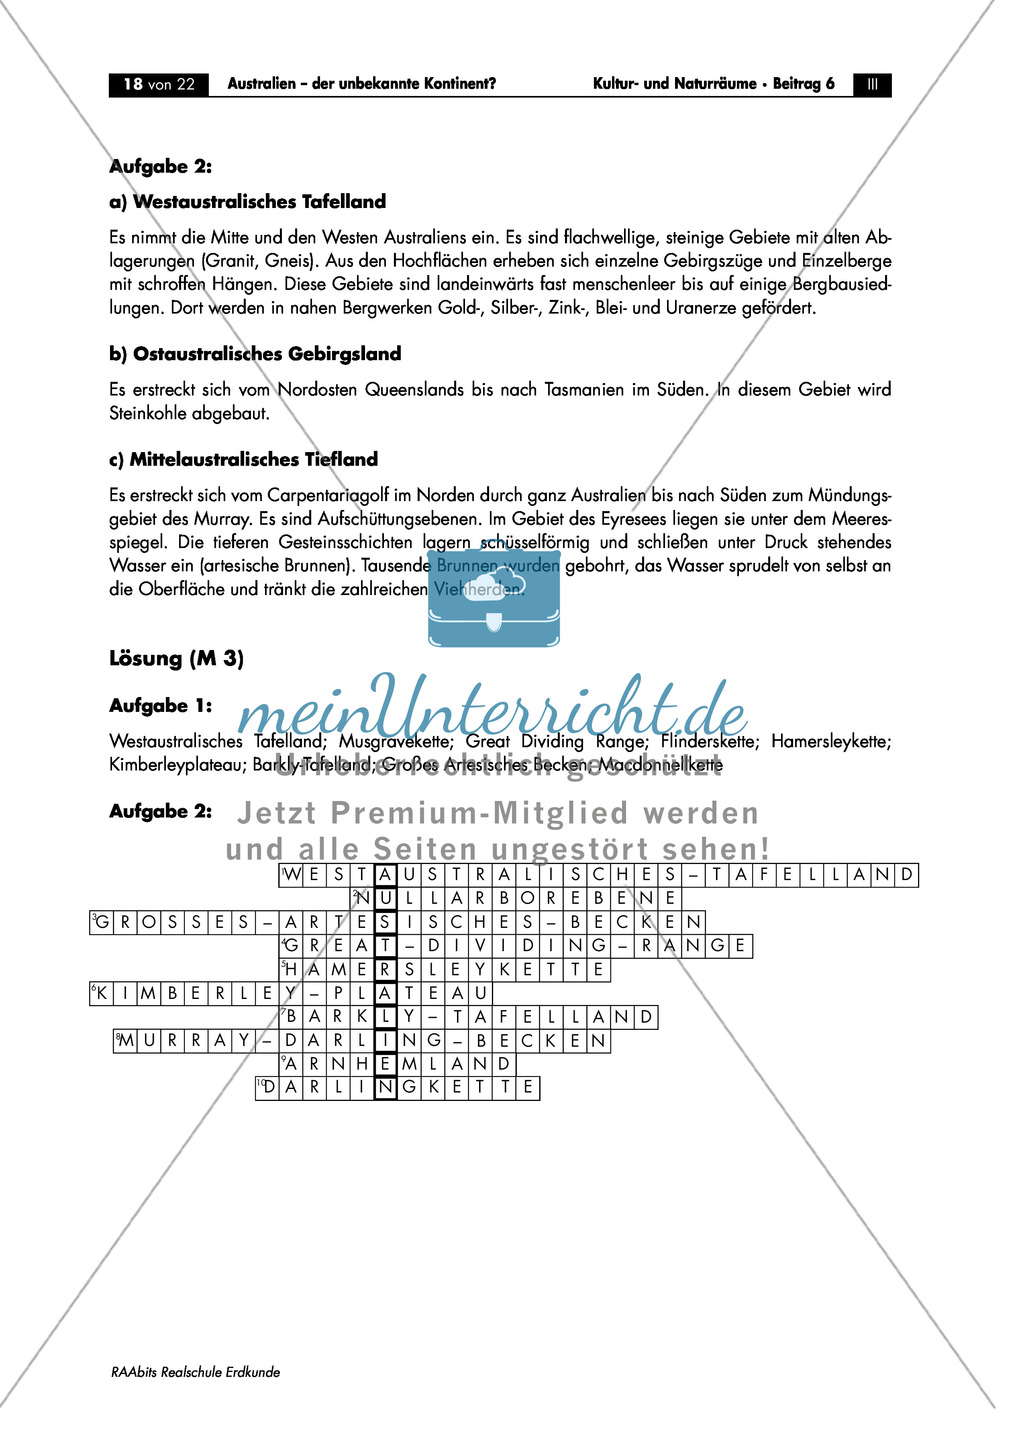 Erfreut Jahr 2 Mathe Arbeitsblatt Australien Ideen - Super Lehrer ...